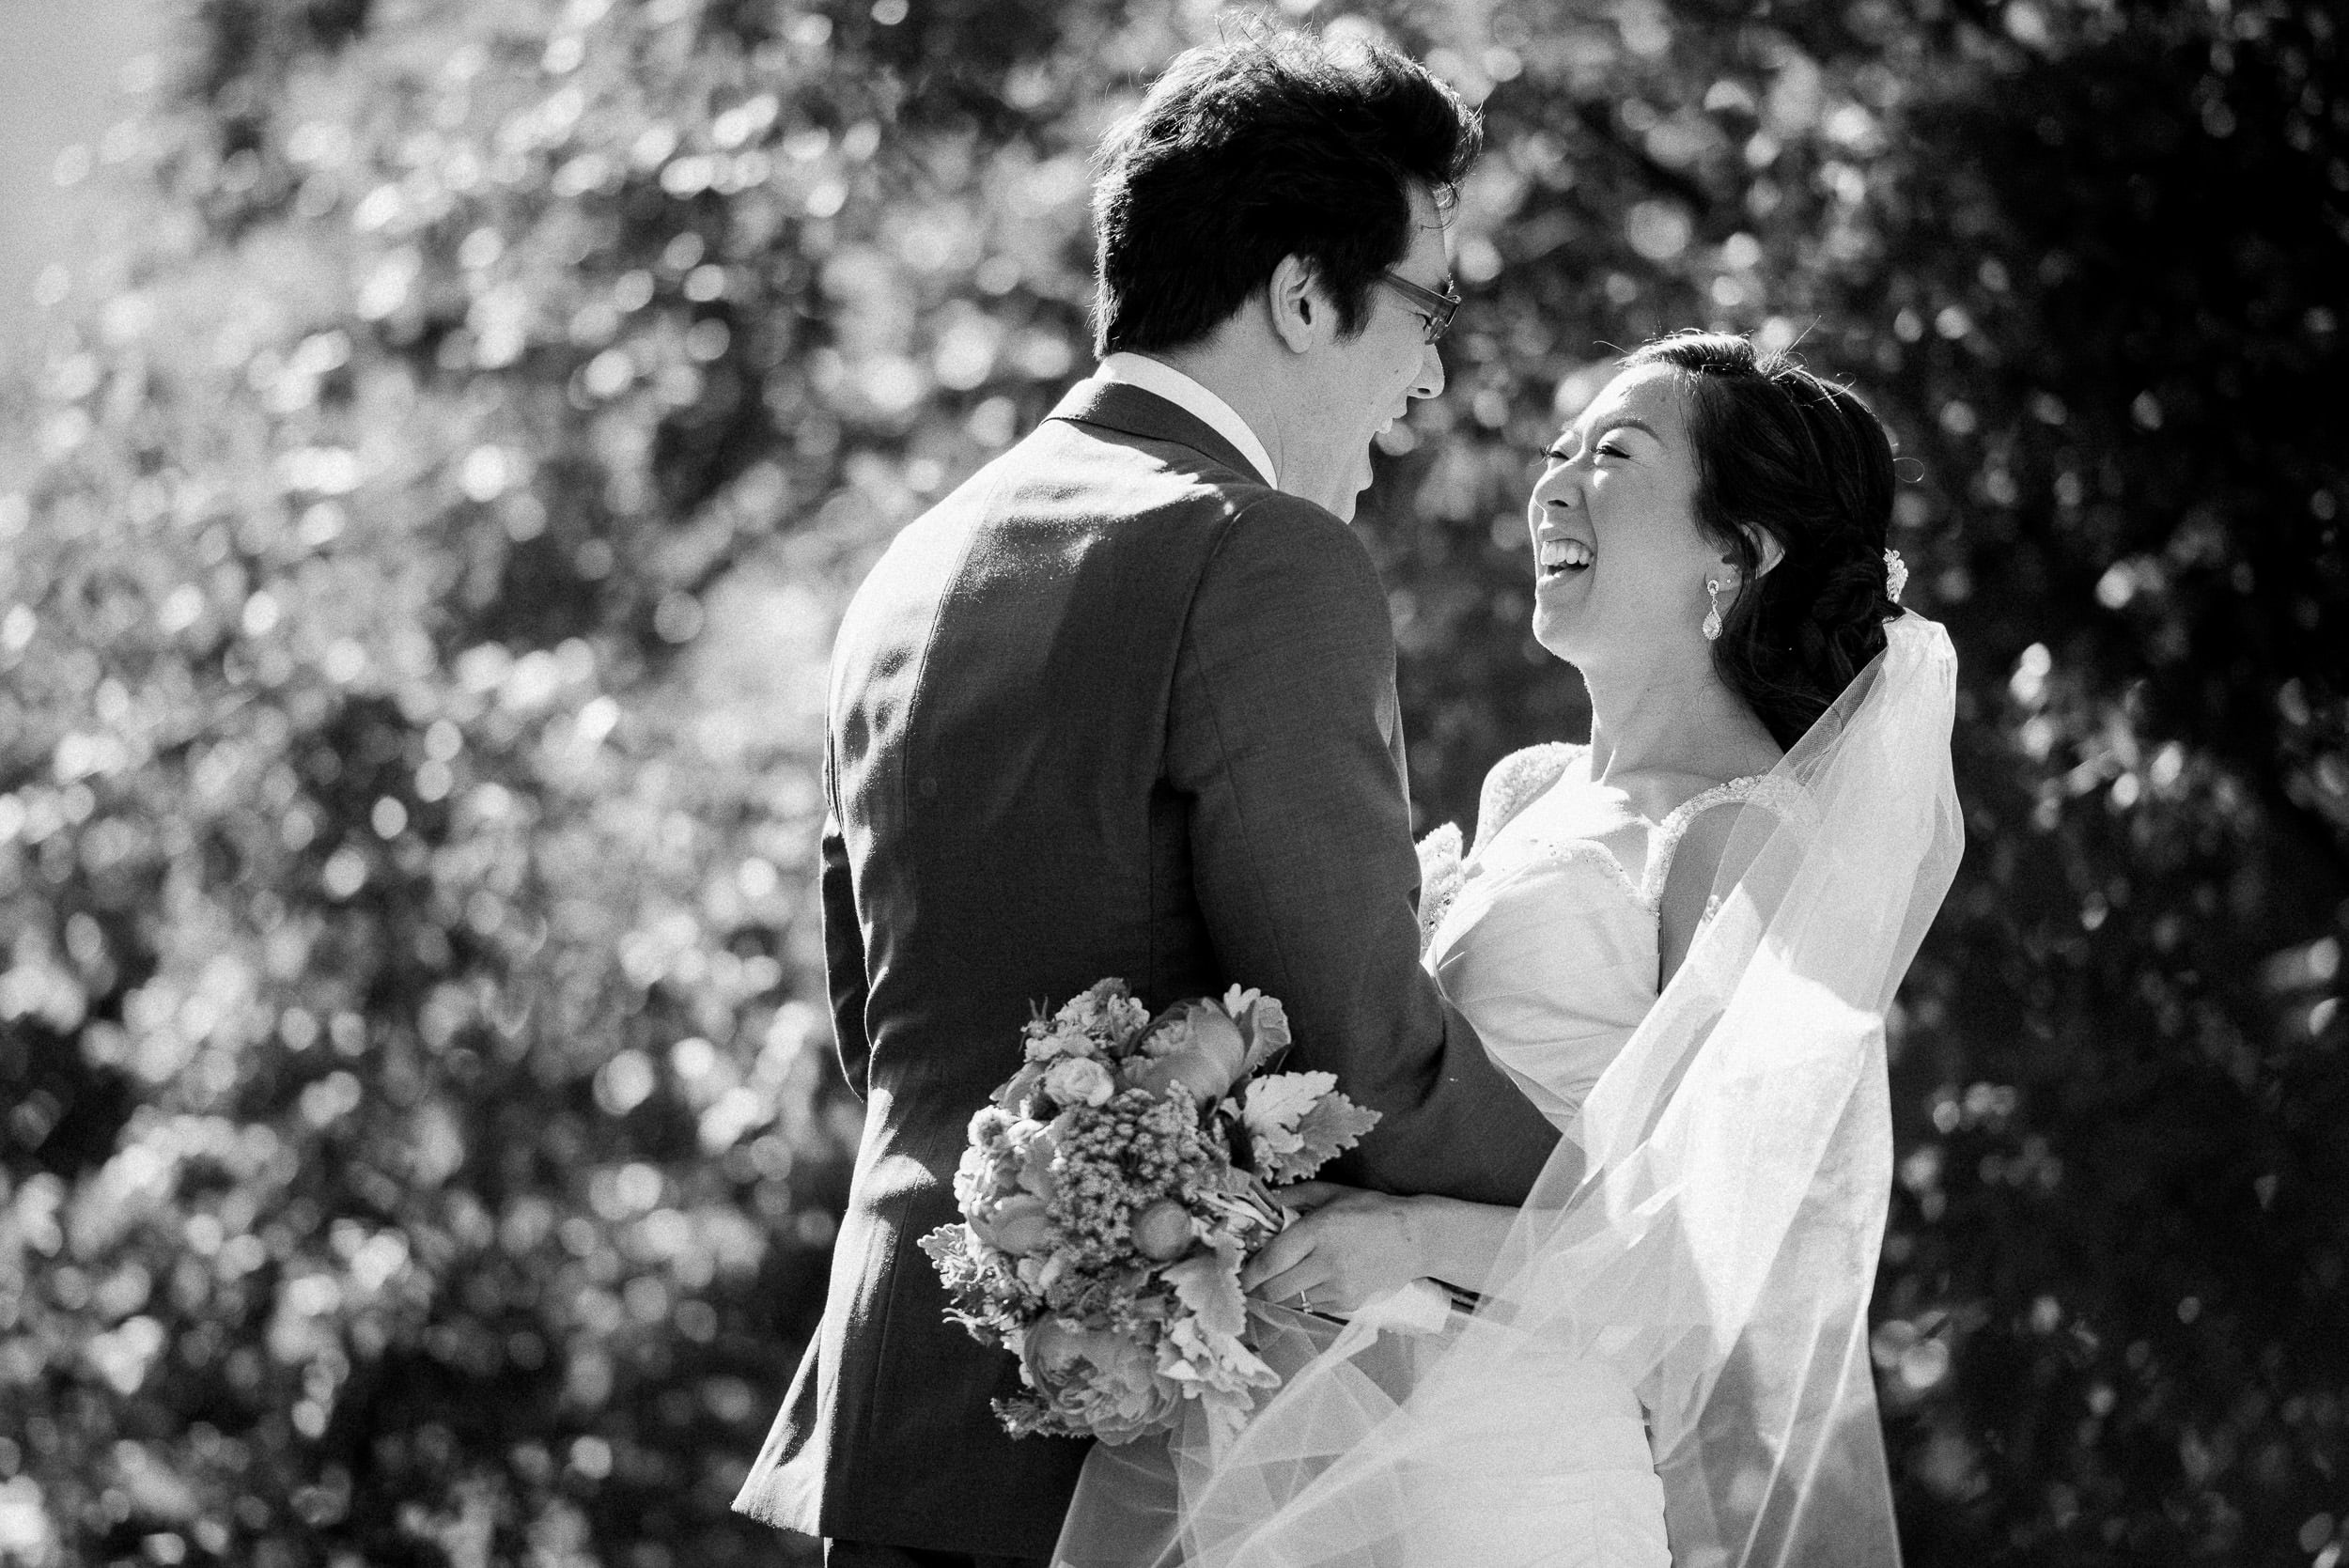 Moraga Valley Church wedding 012.jpg